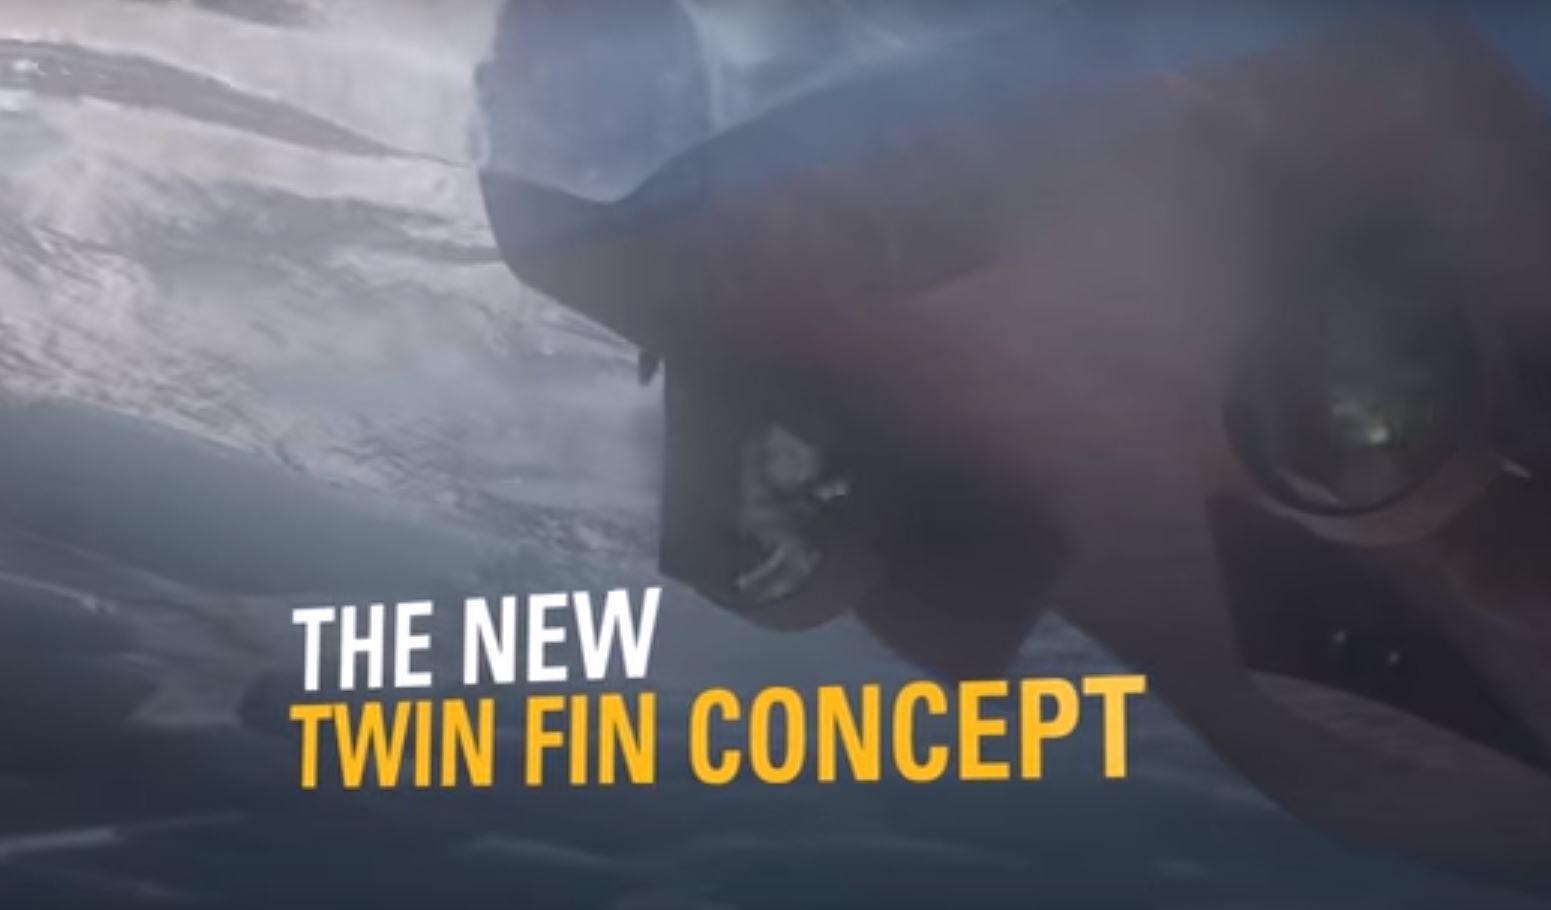 Twin Fin - Caterpillar Propulsion System - Retrofit